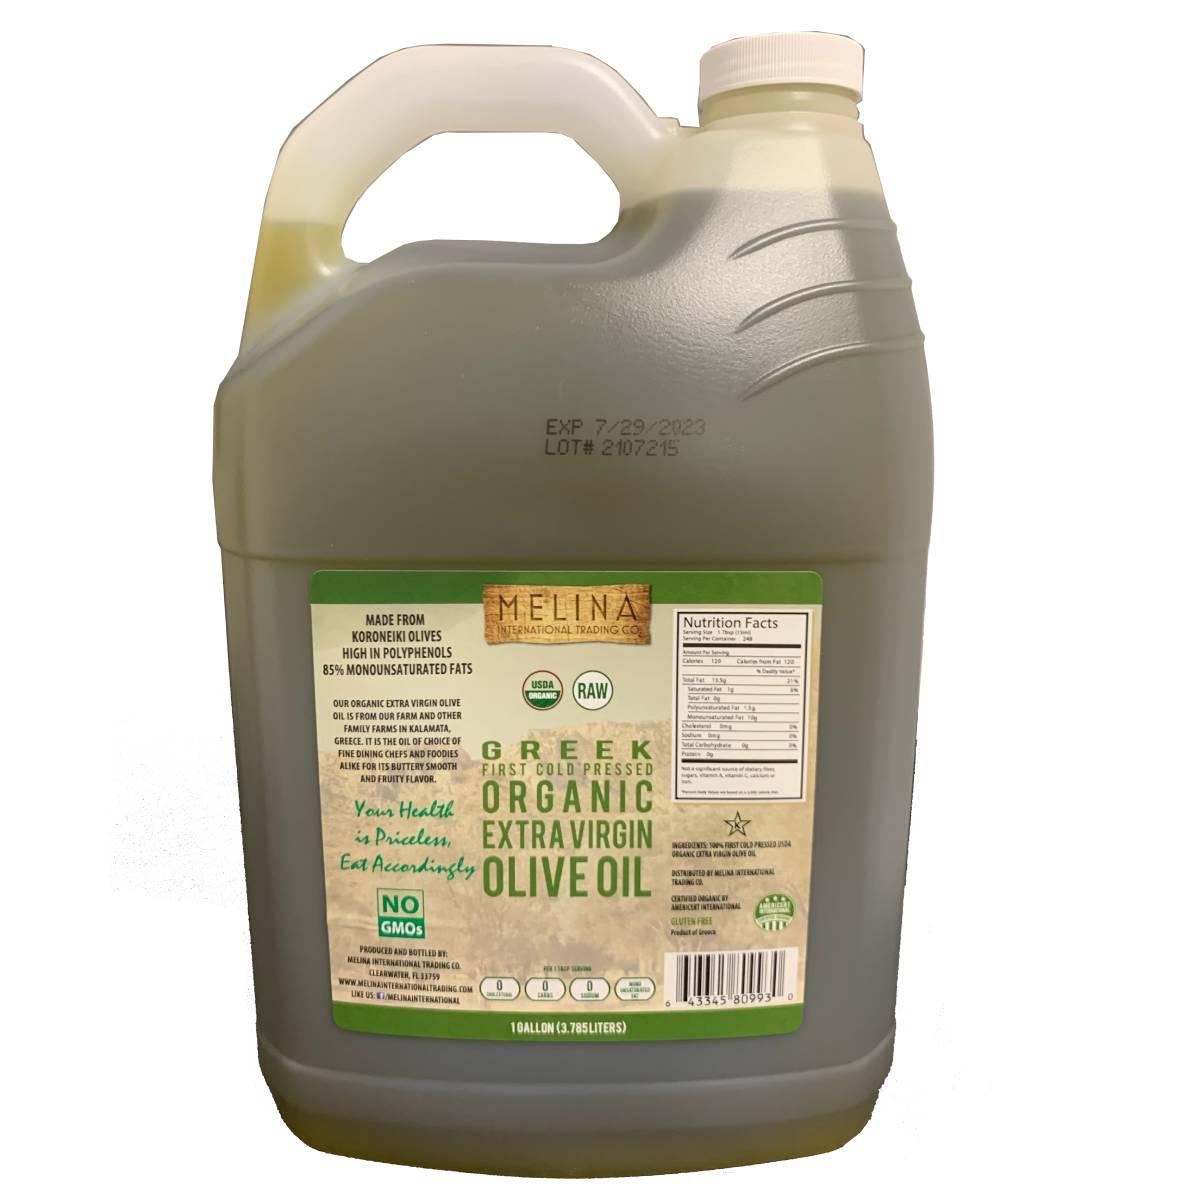 melina international company olive oil 1 gallon